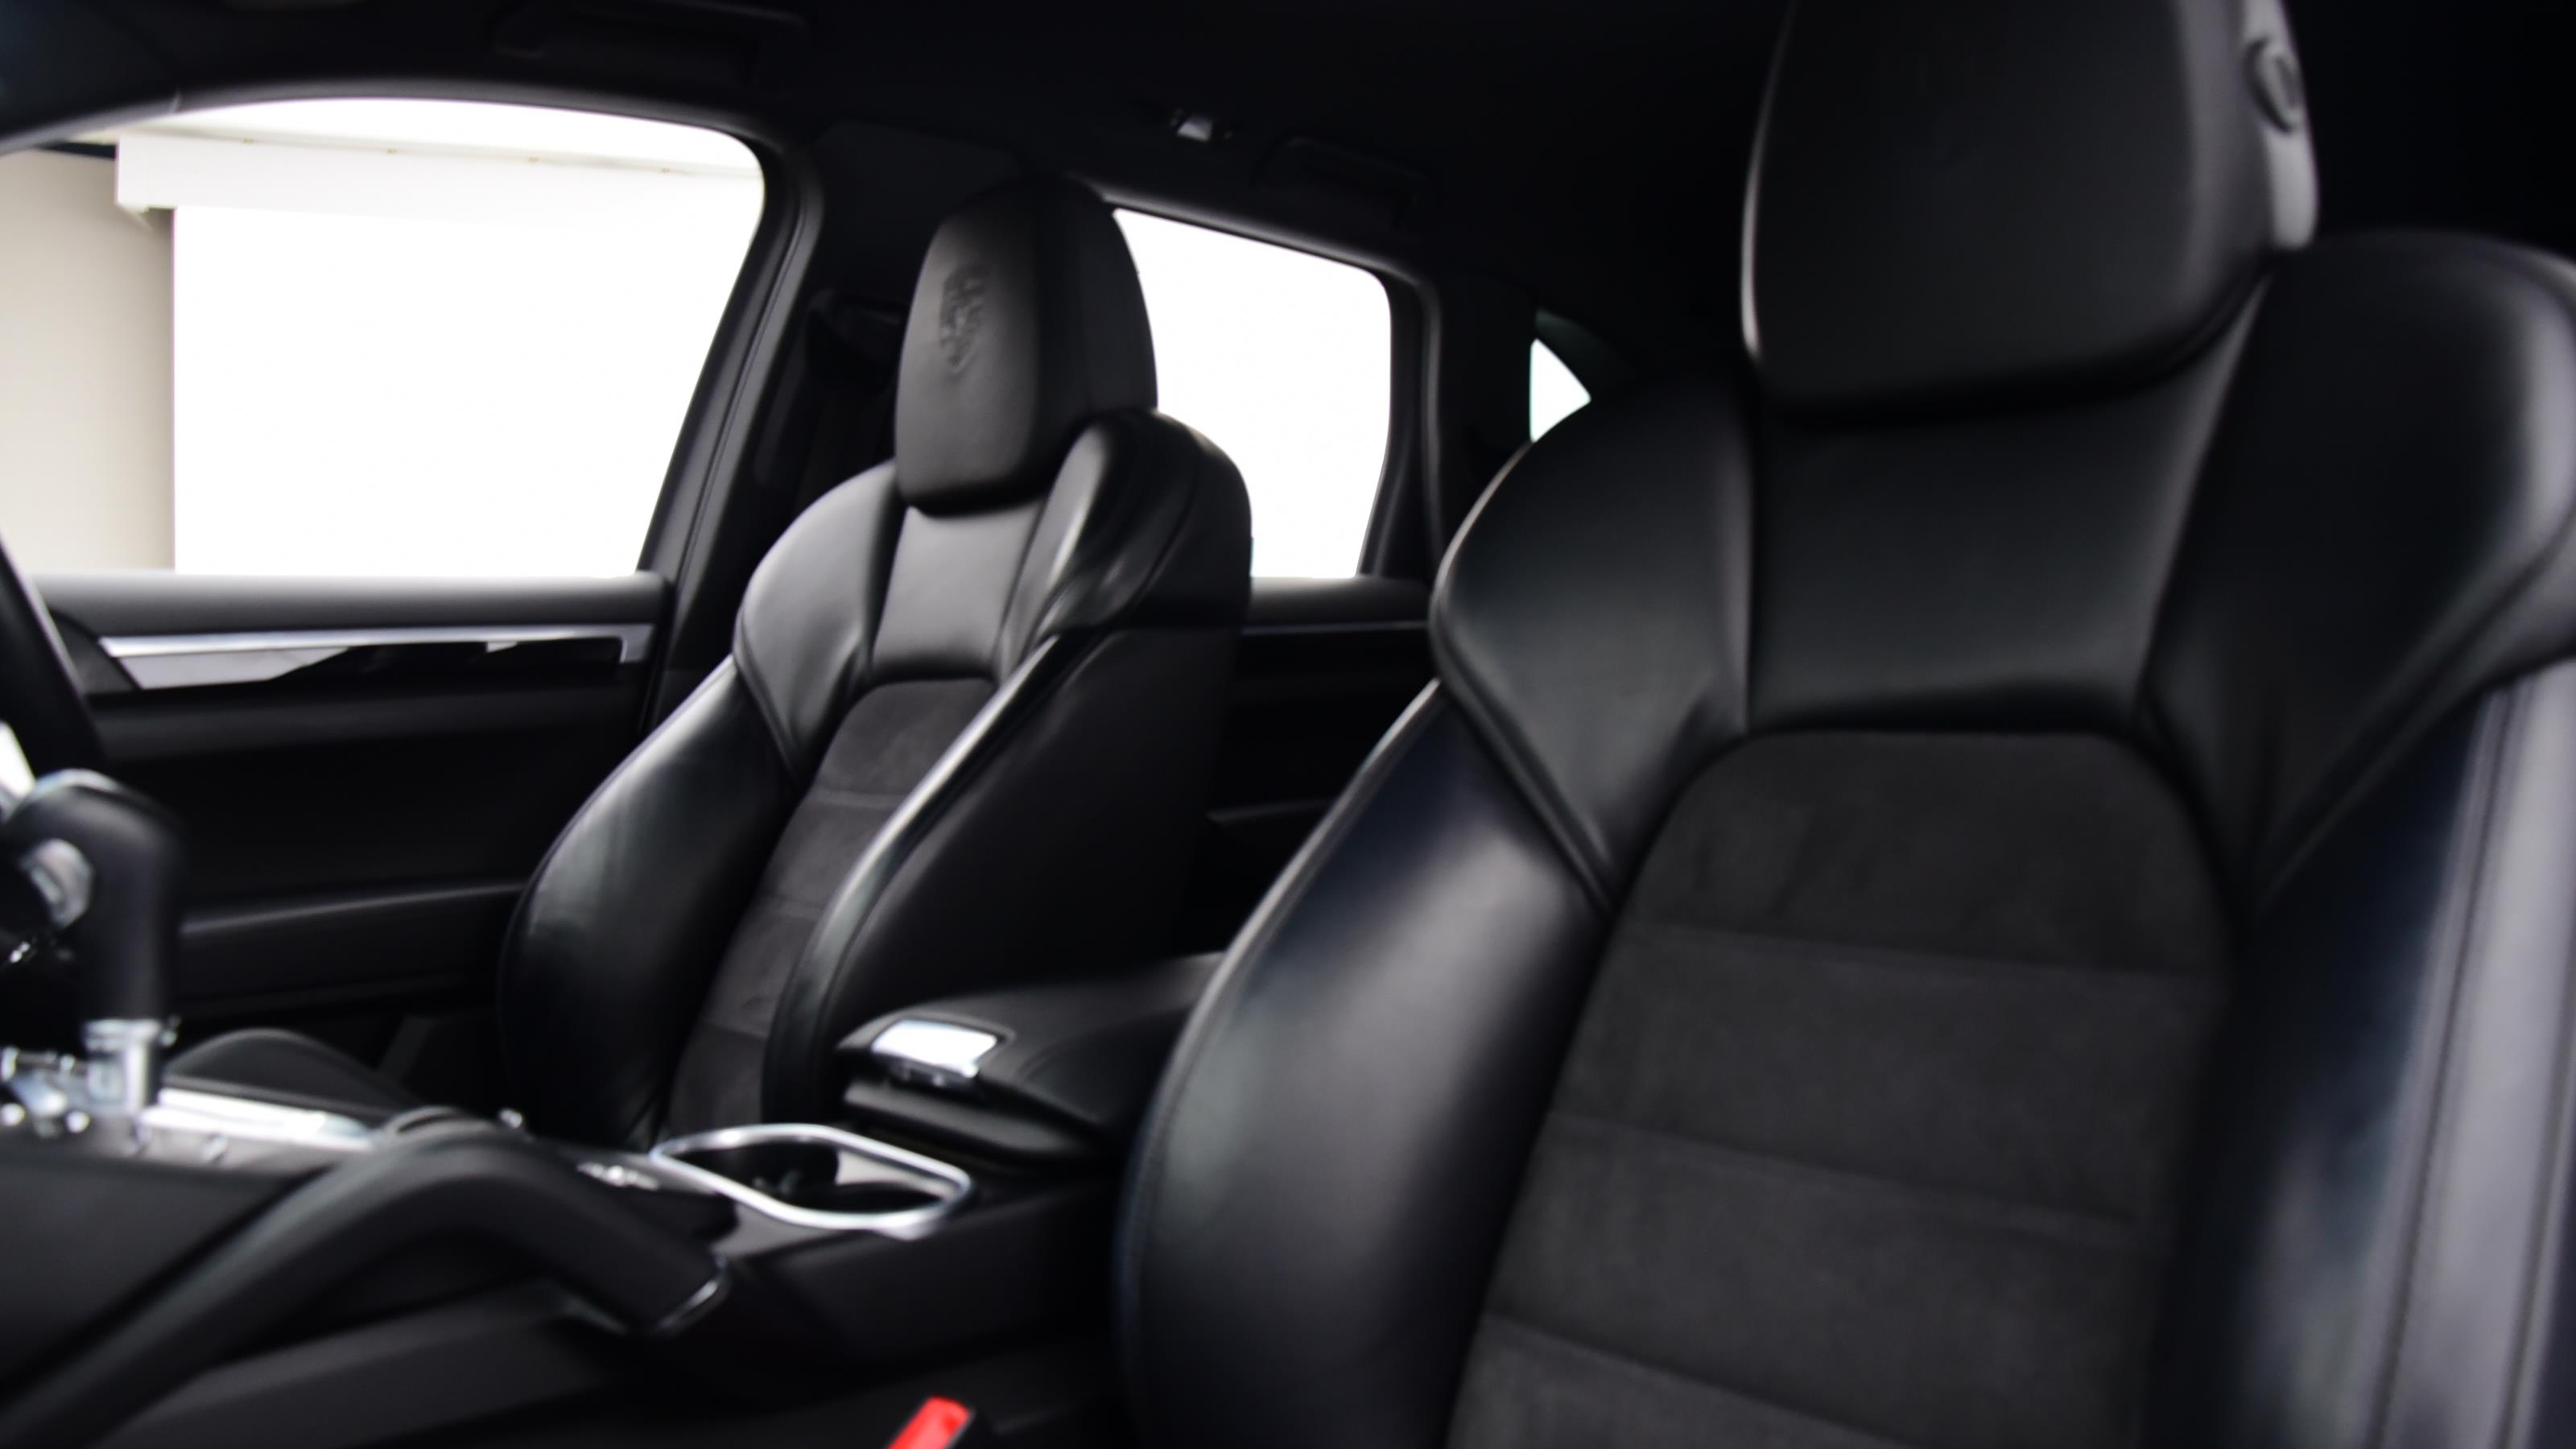 Used 2017 Porsche CAYENNE Platinum Edition Diesel 5dr Tiptronic S BLACK at Saxton4x4